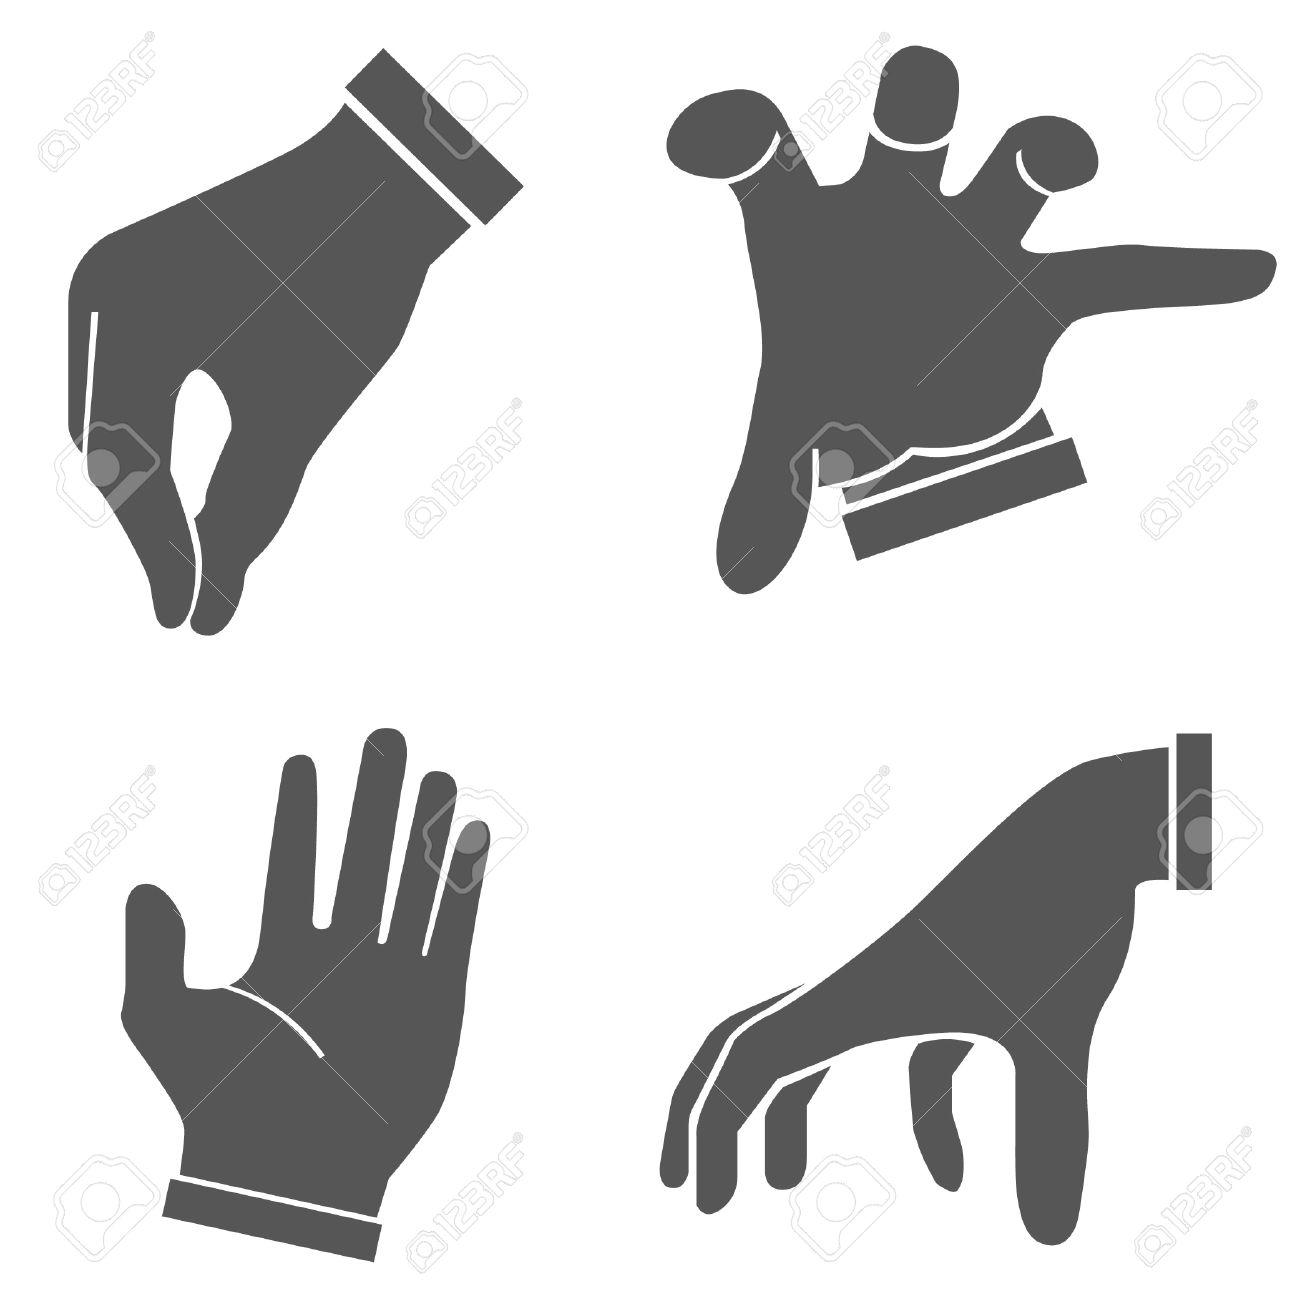 hand set, hand sign - 22786205